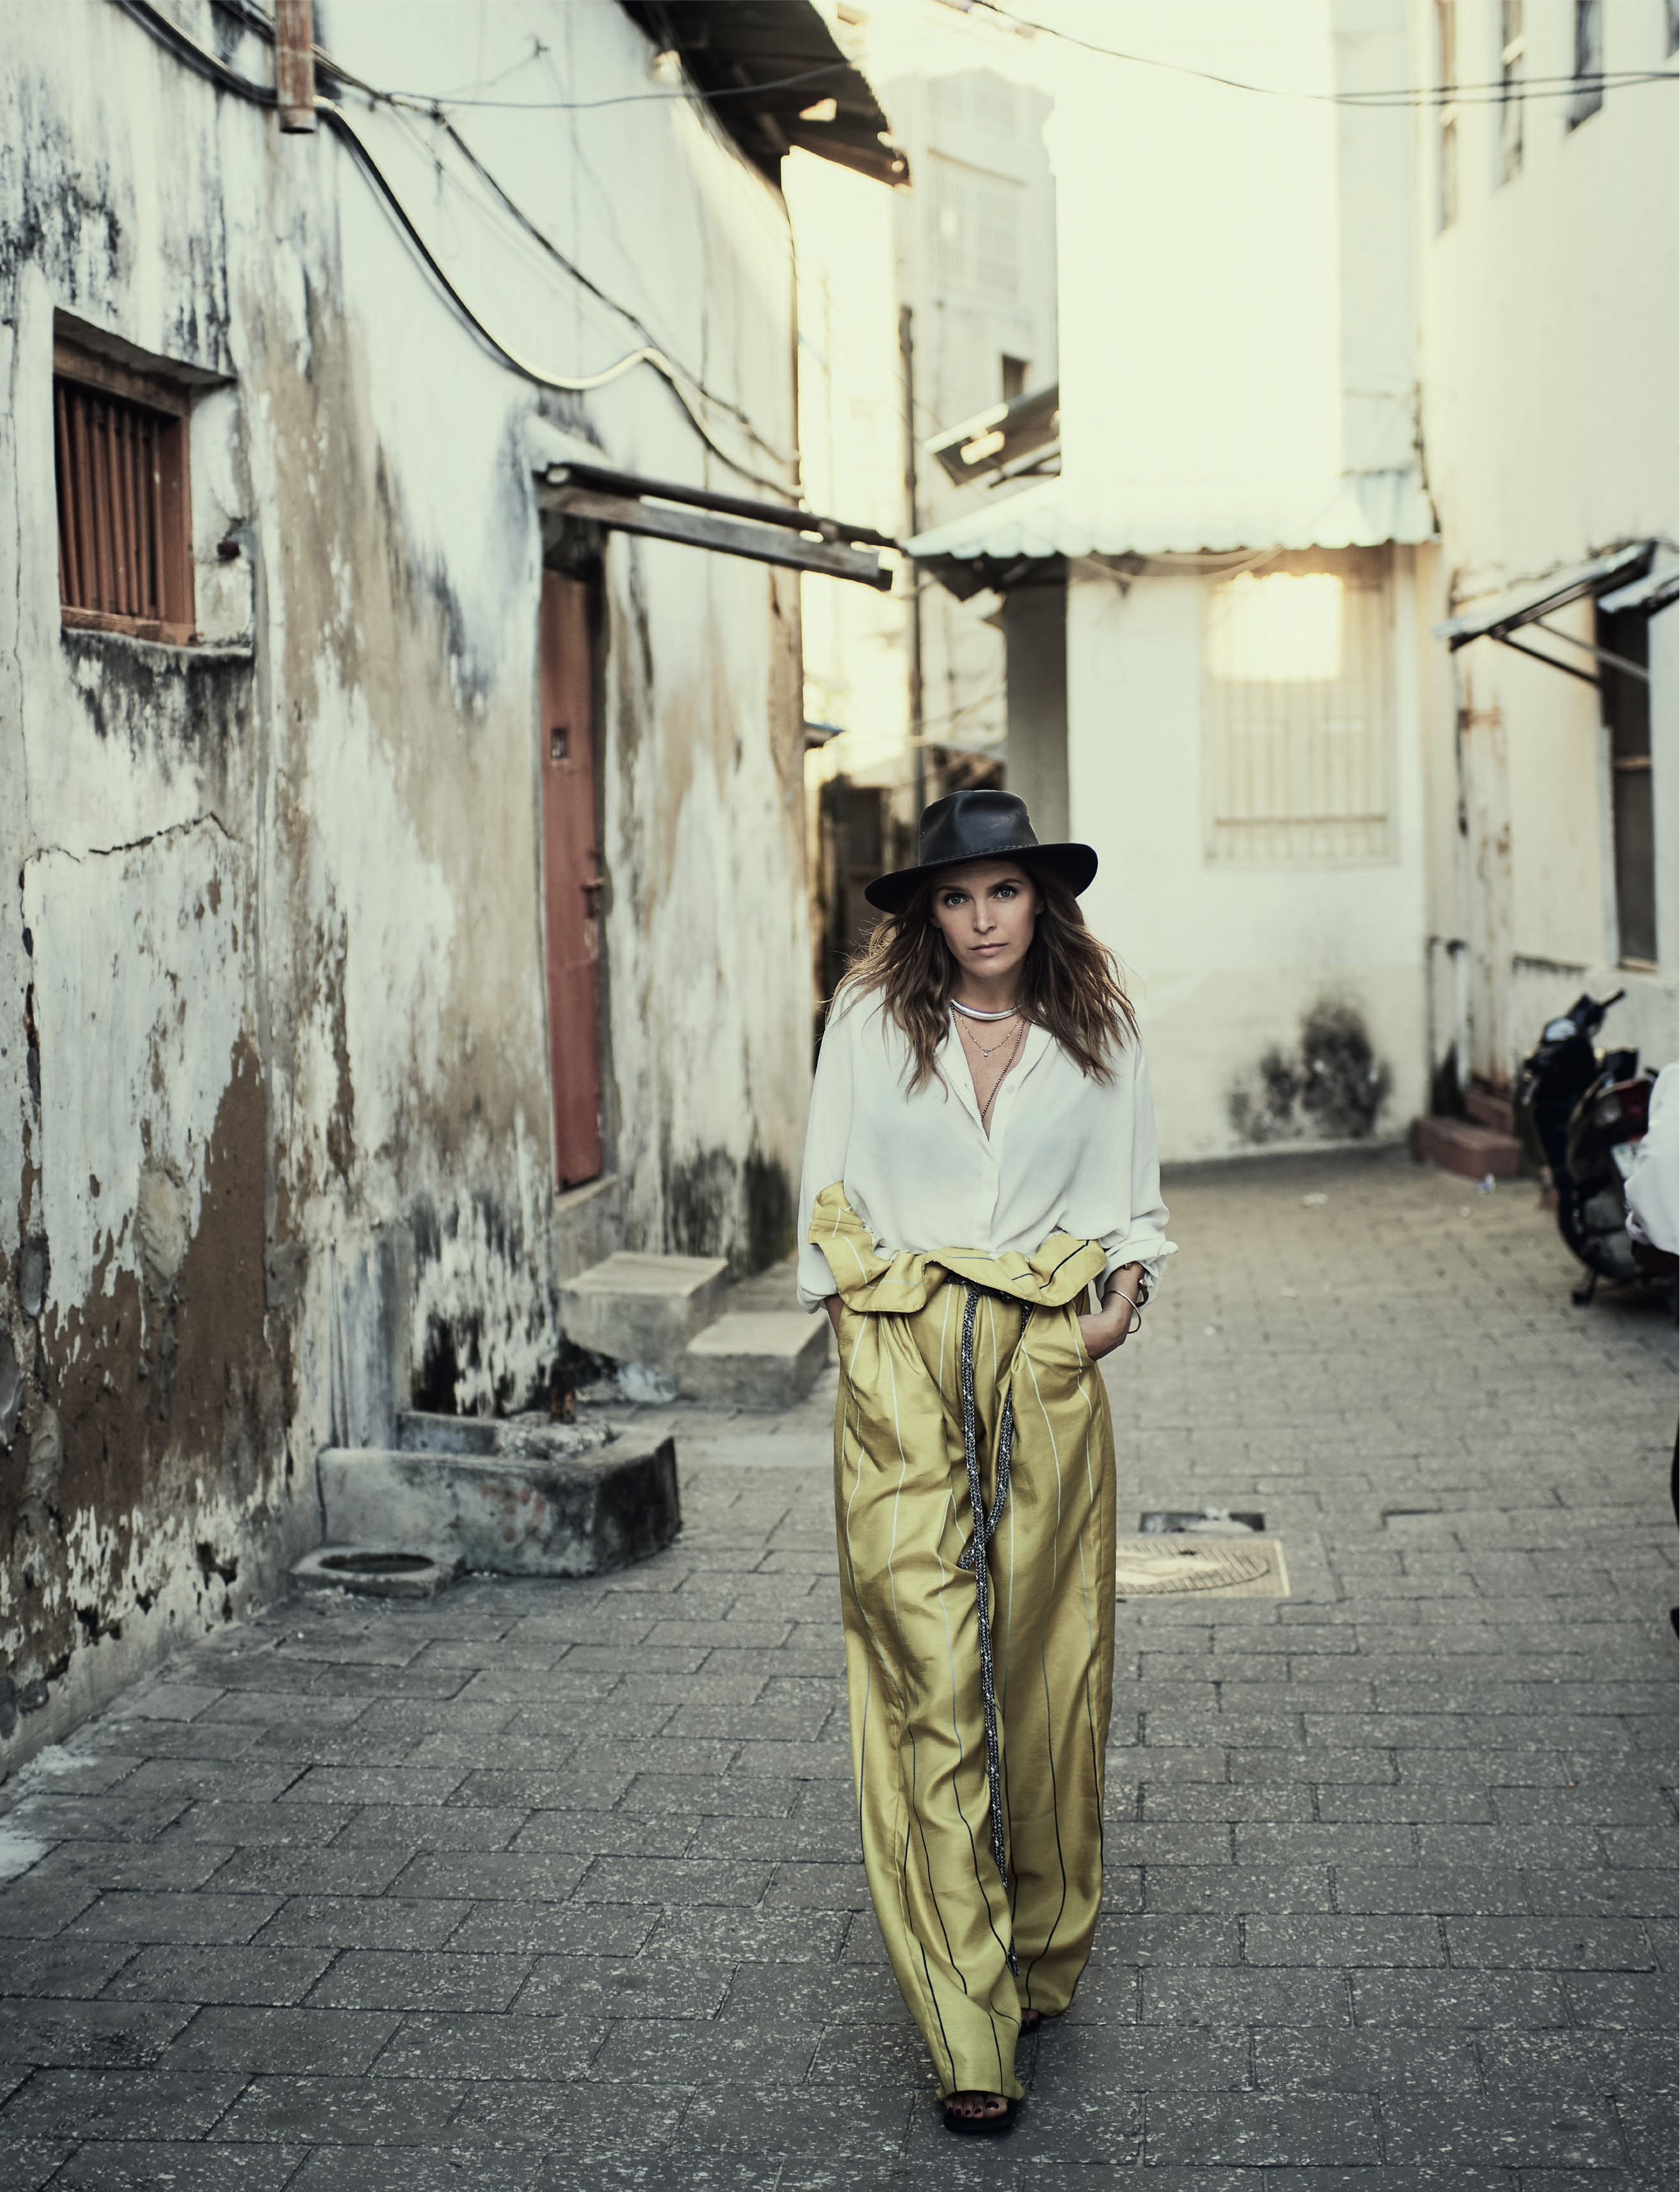 Hanna-Verboom-Vogue-Pit-Bomans-3